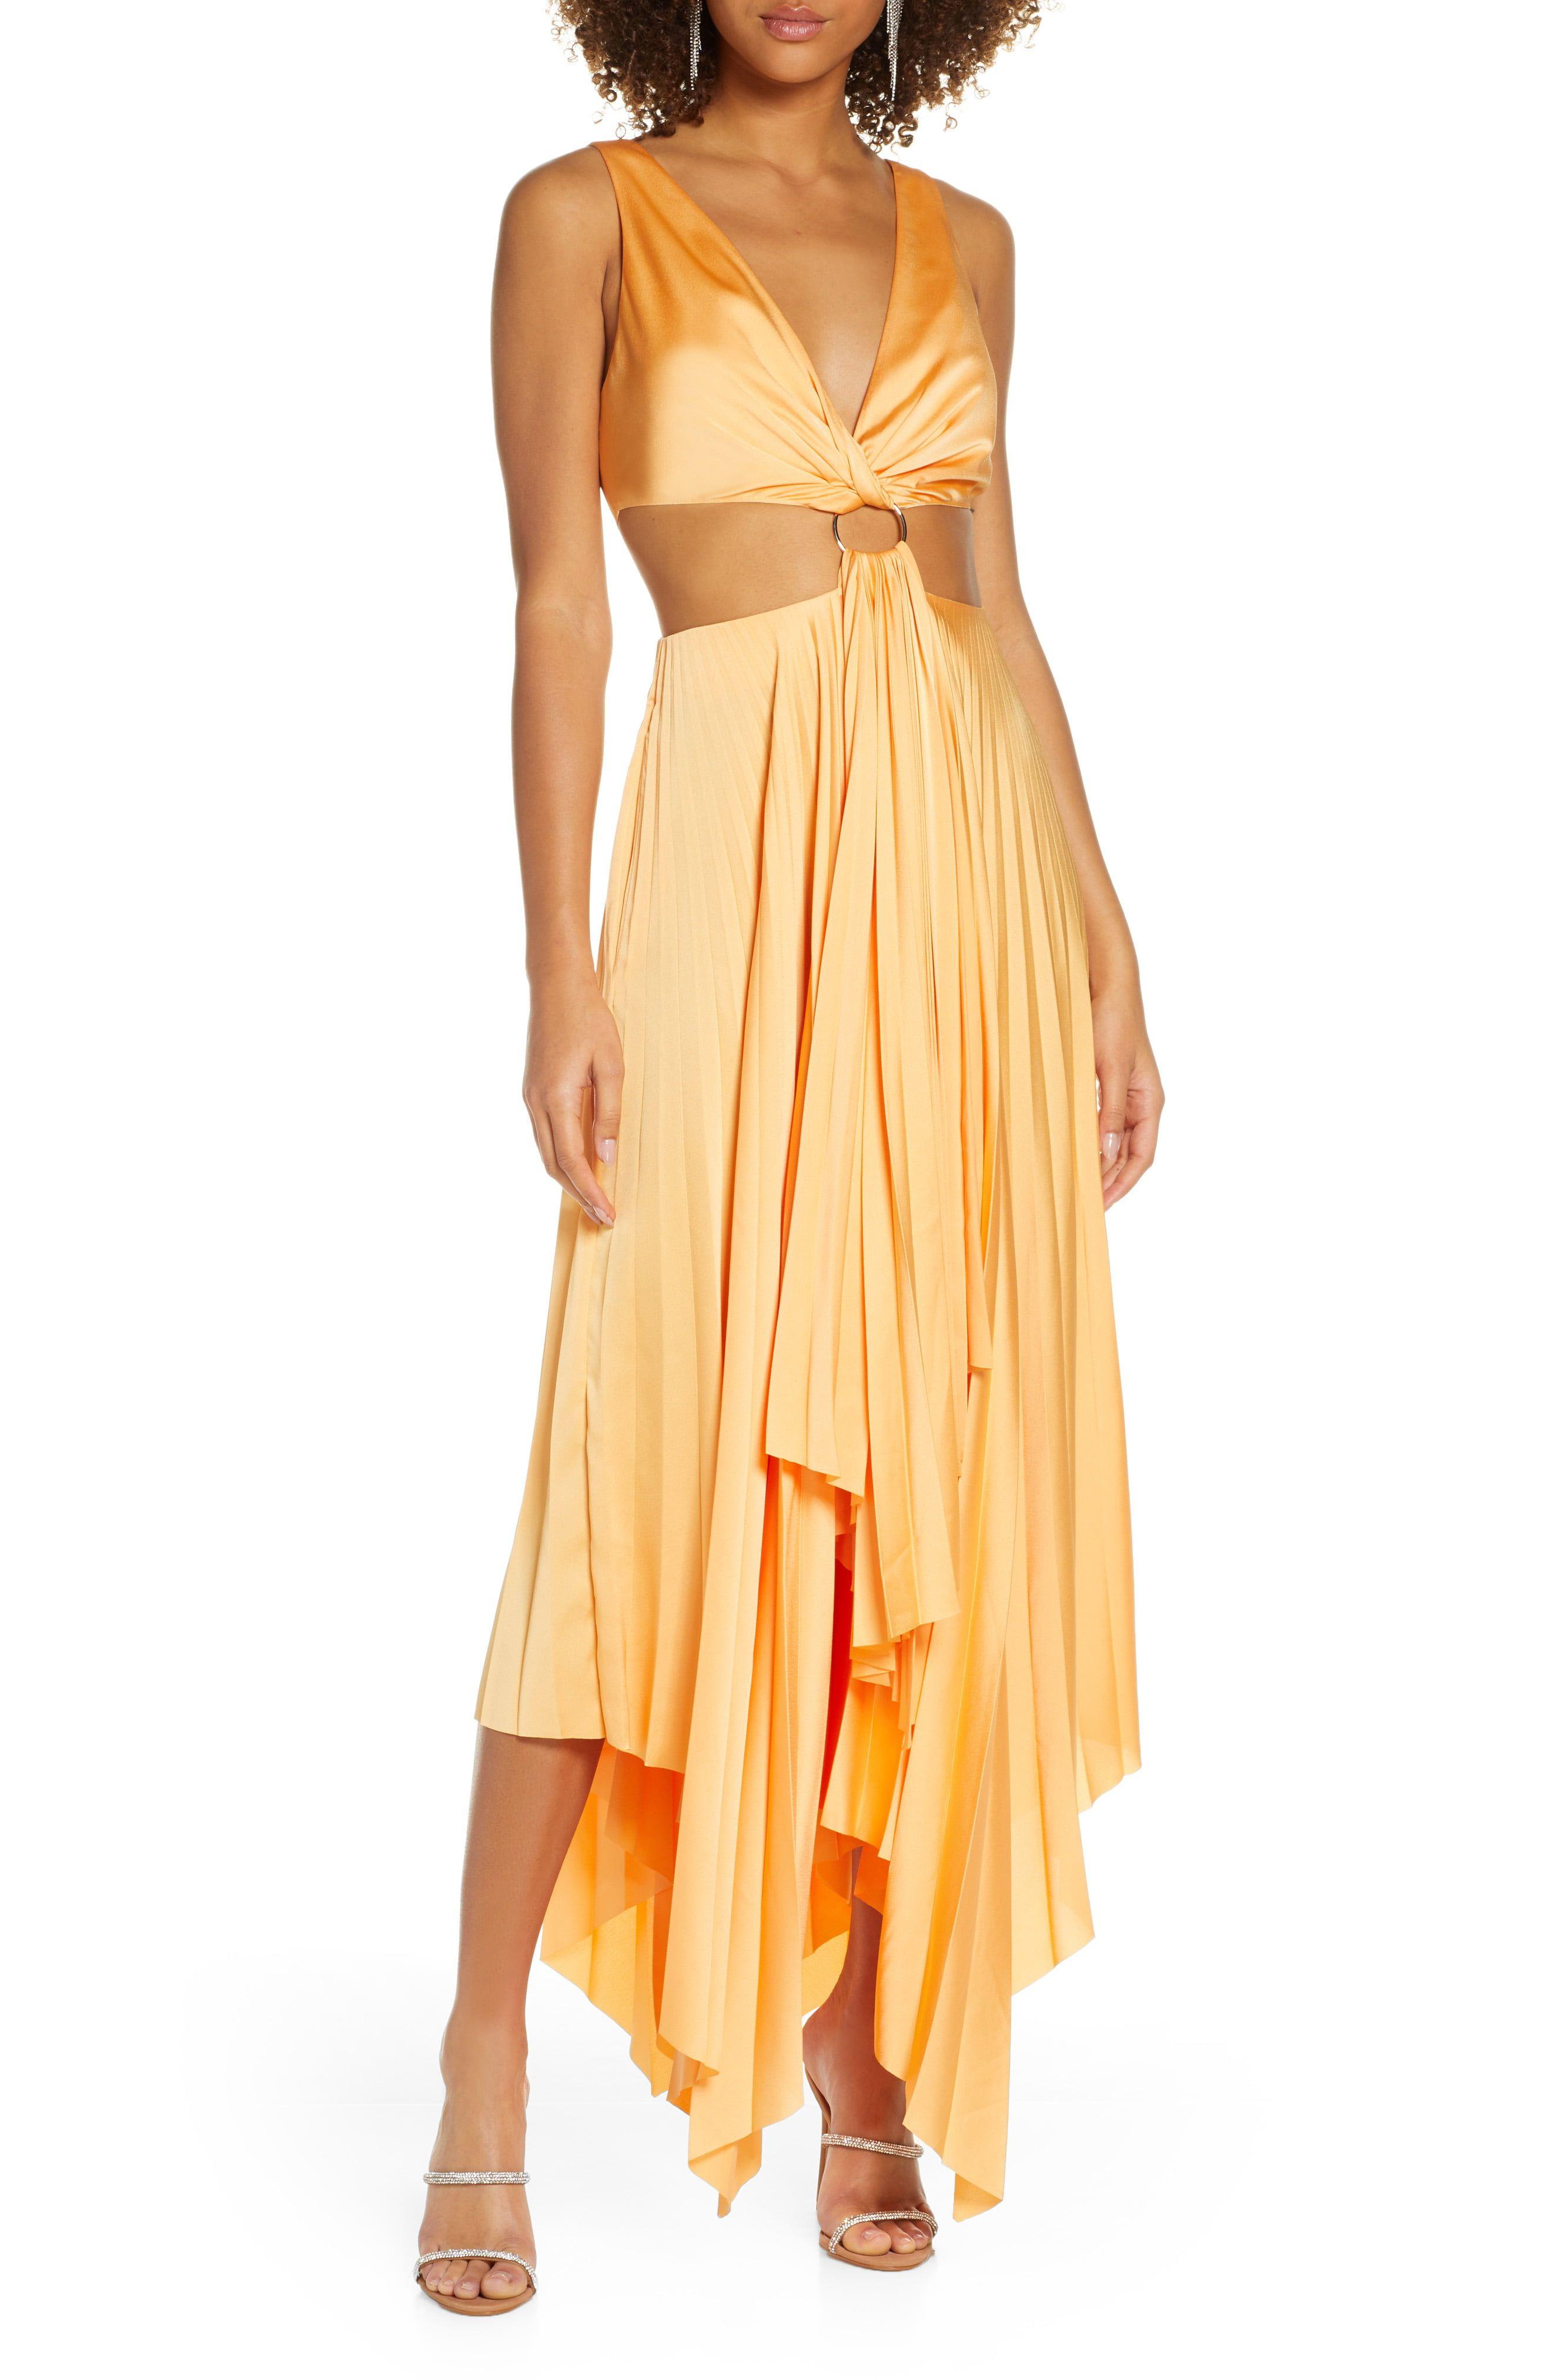 70s Prom Formal Evening Party Dresses Satin Maxi Dress Fashion Clothes Women Satin Cocktail Dress [ 4048 x 2640 Pixel ]